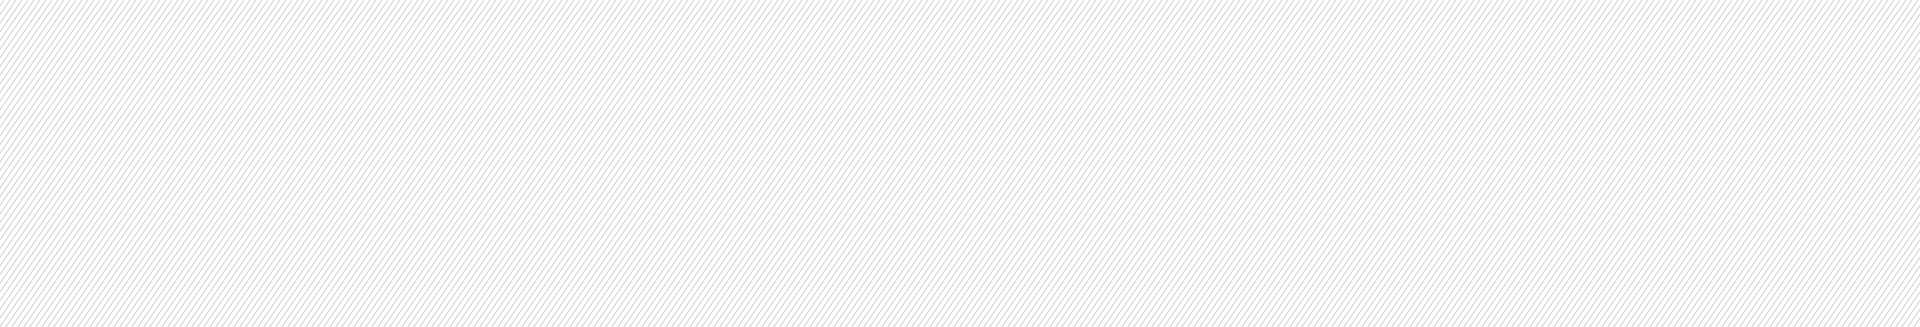 stripes-K.jpg